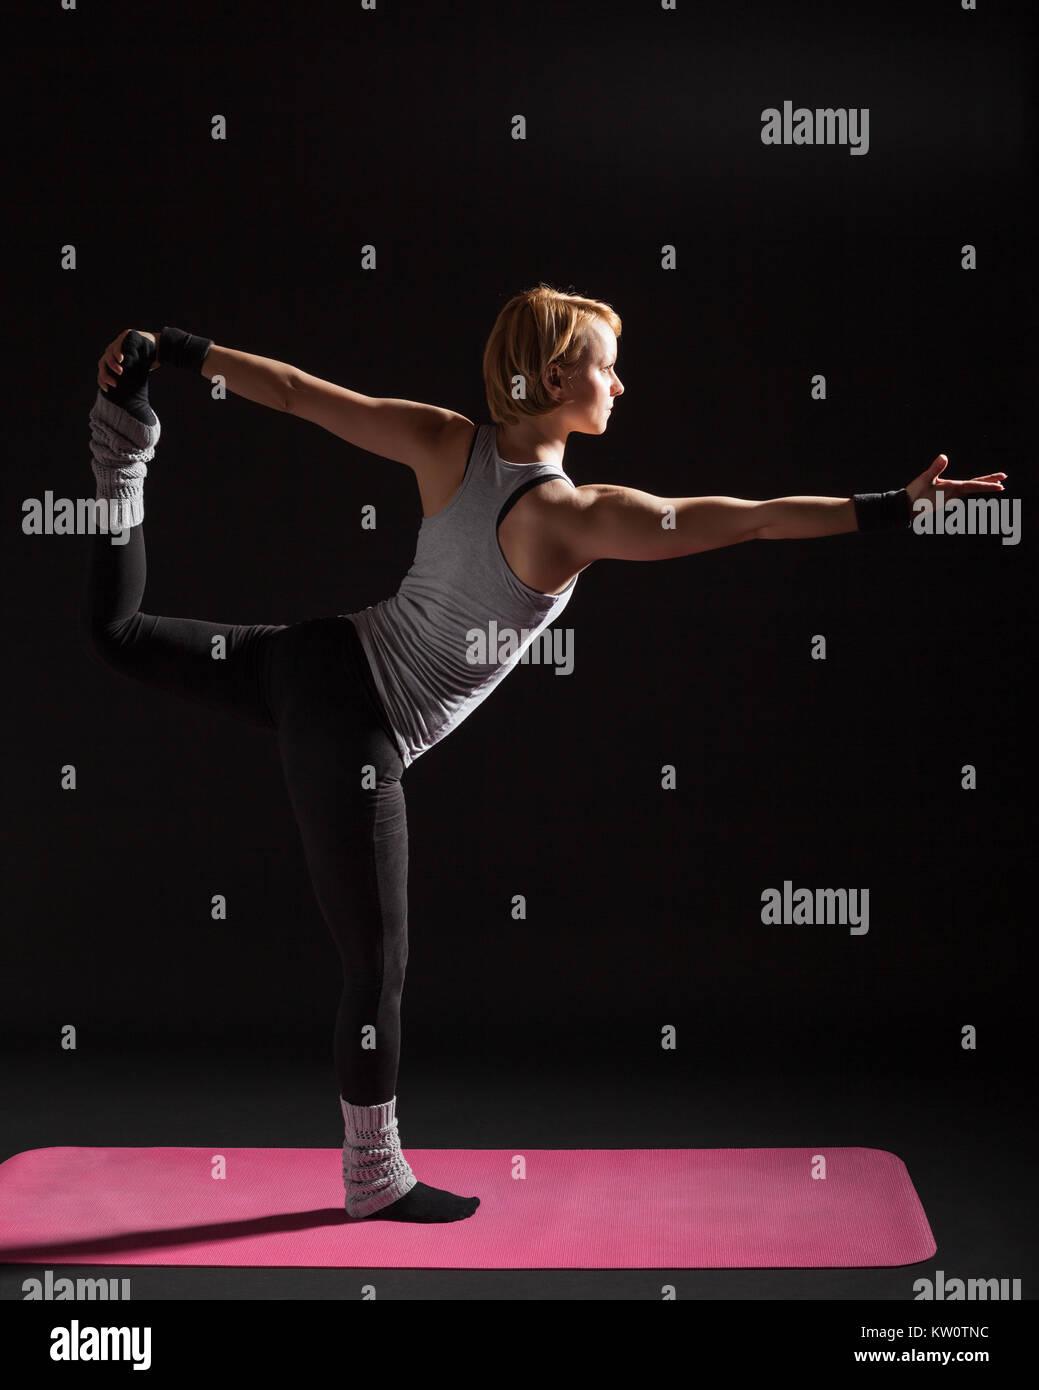 Junge Frau Üben Yoga, Natarajasana/Shiva Körperhaltung darstellen Stockfoto